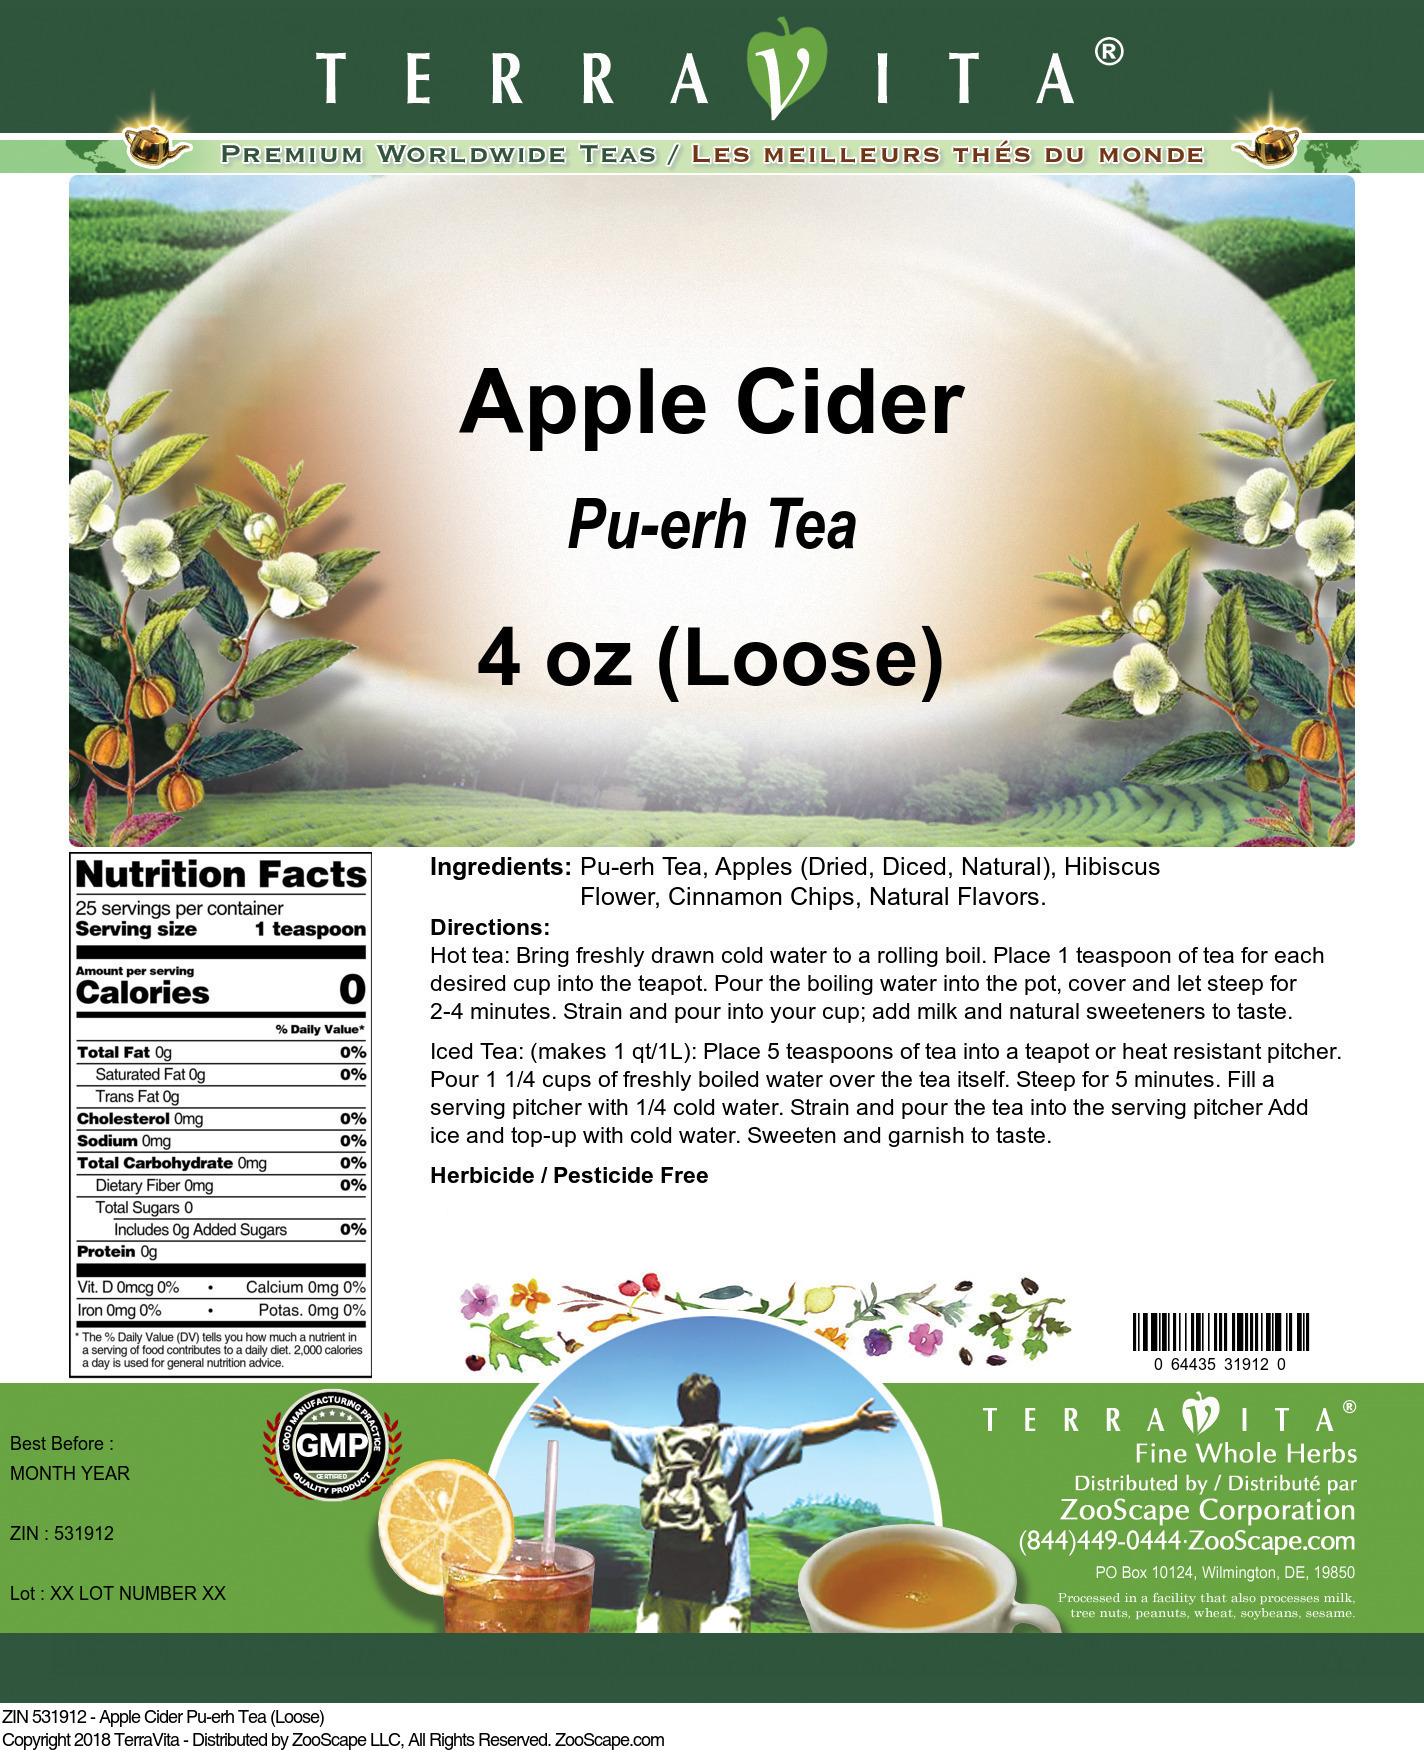 Apple Cider Pu-erh Tea